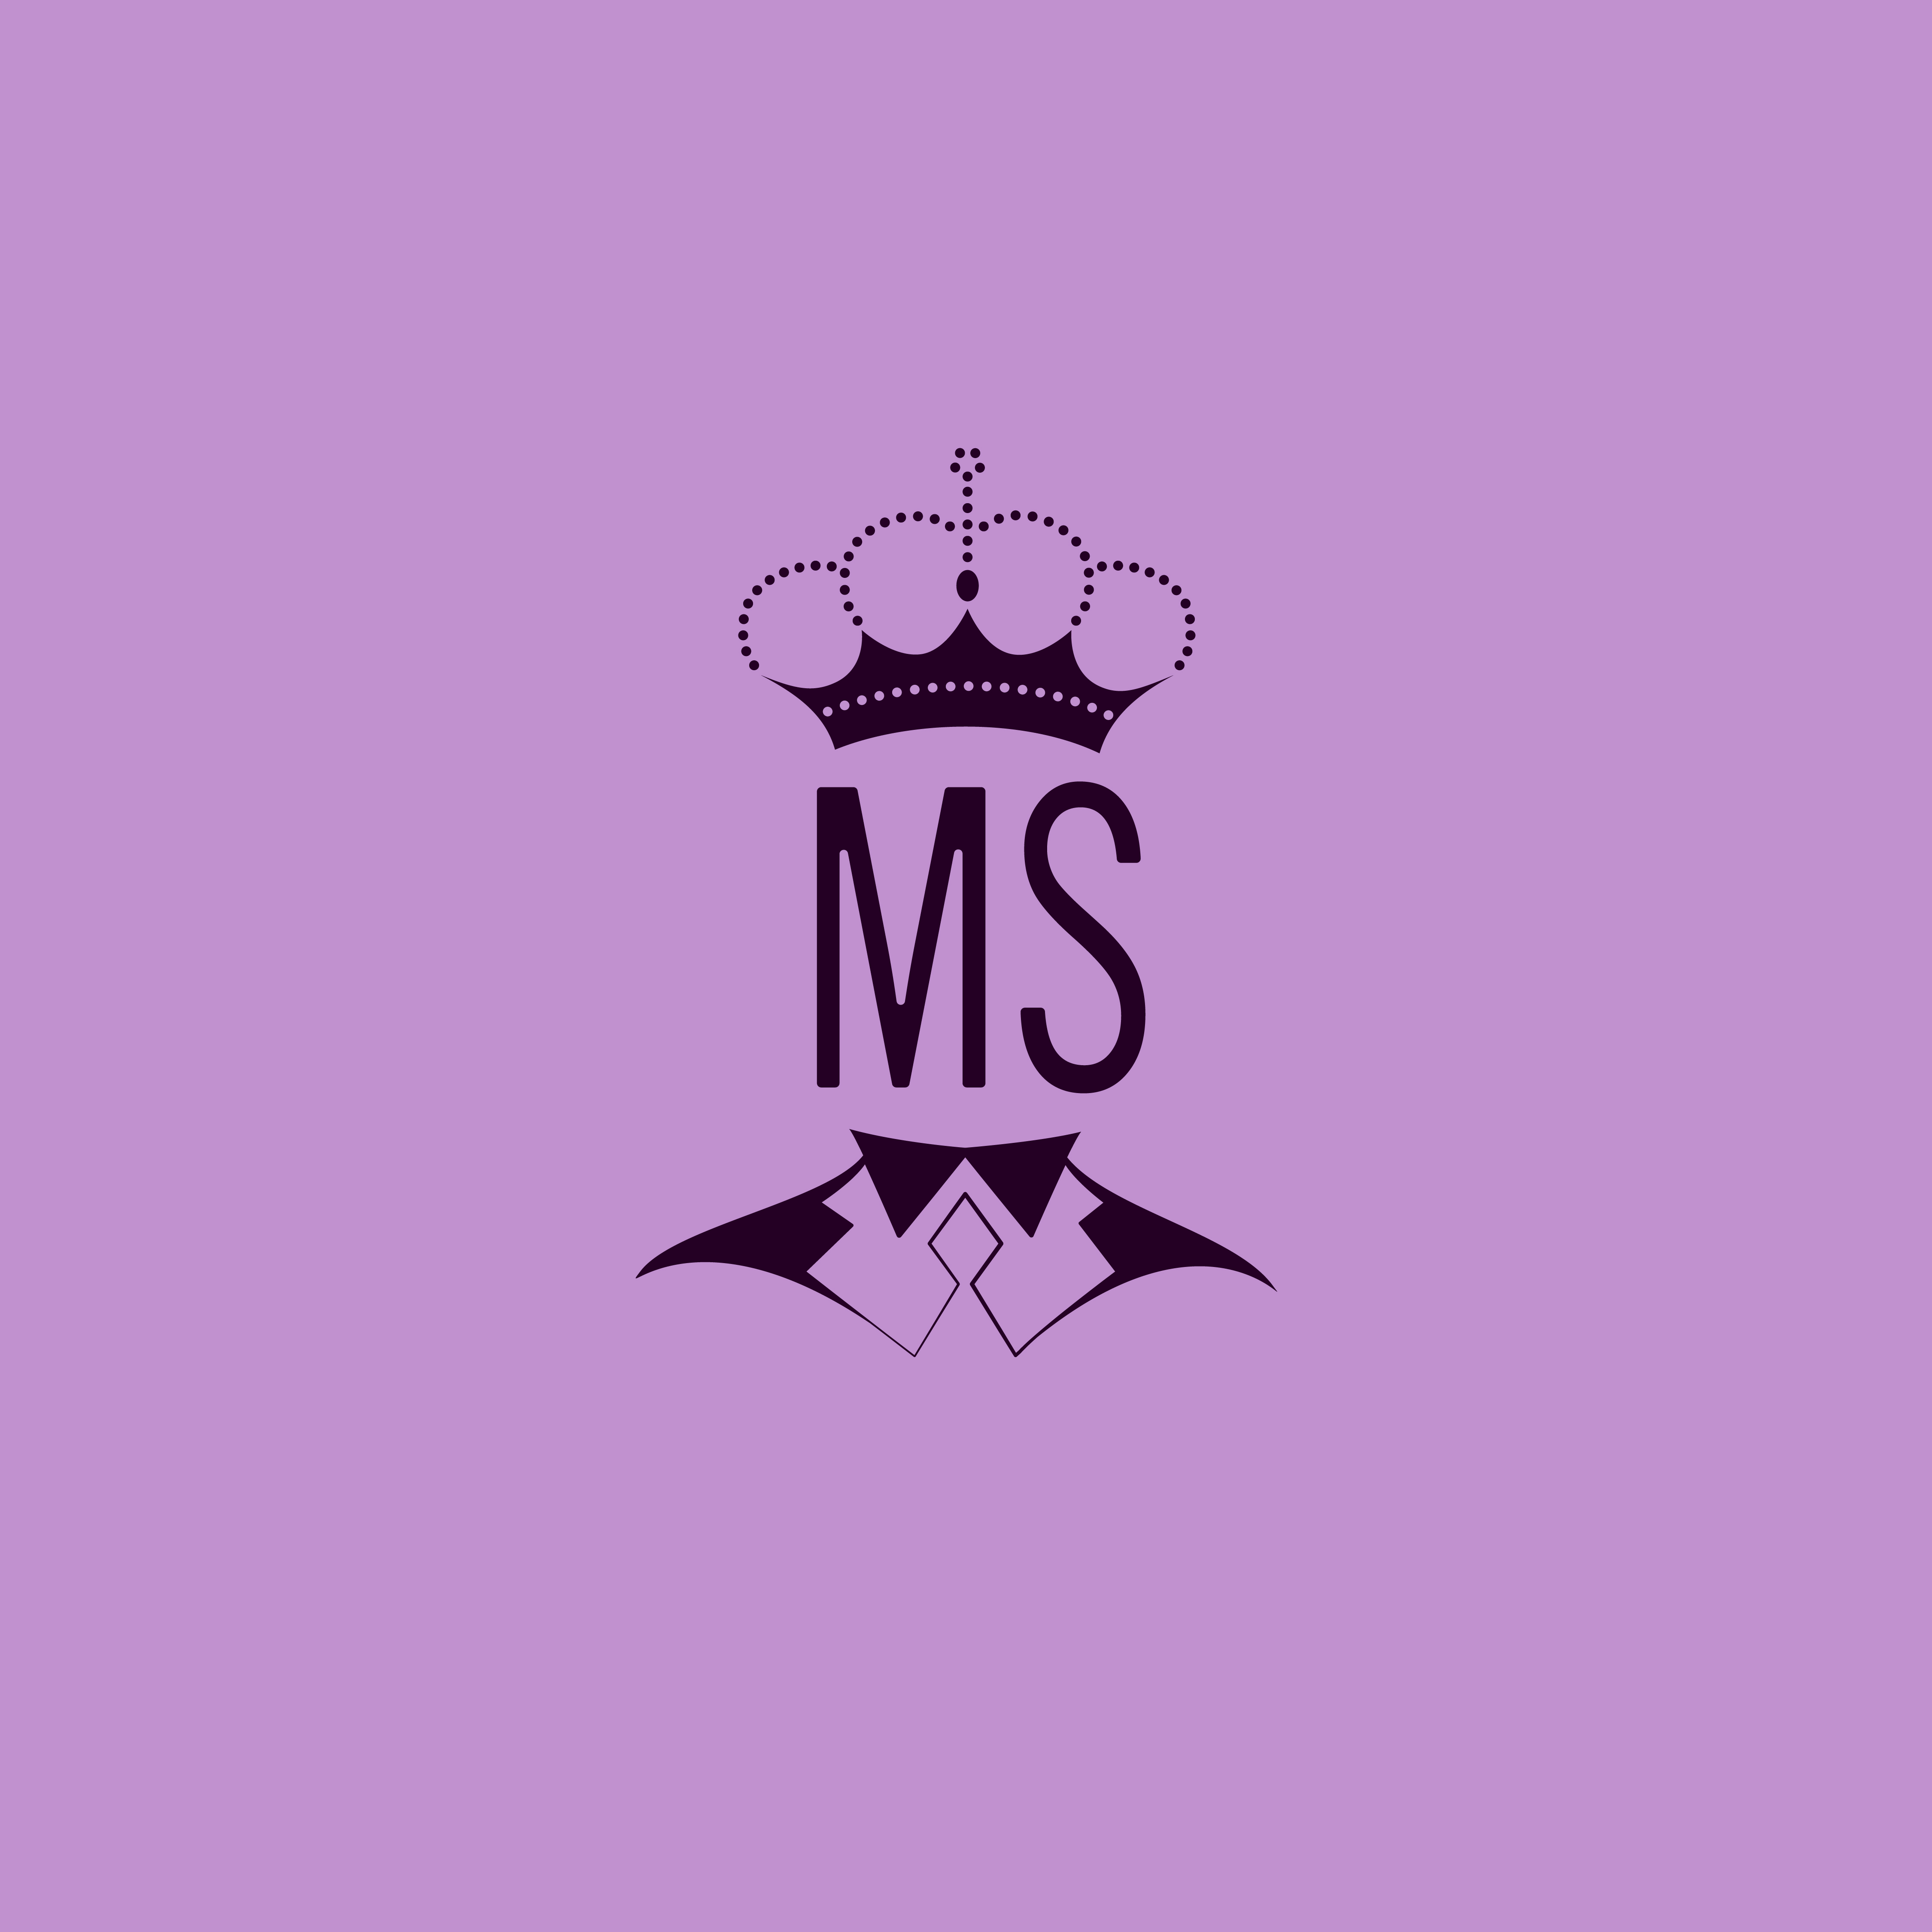 Разработка логотипа для ЛИЧНОГО БРЕНДА.  фото f_7315d0513113147e.jpg